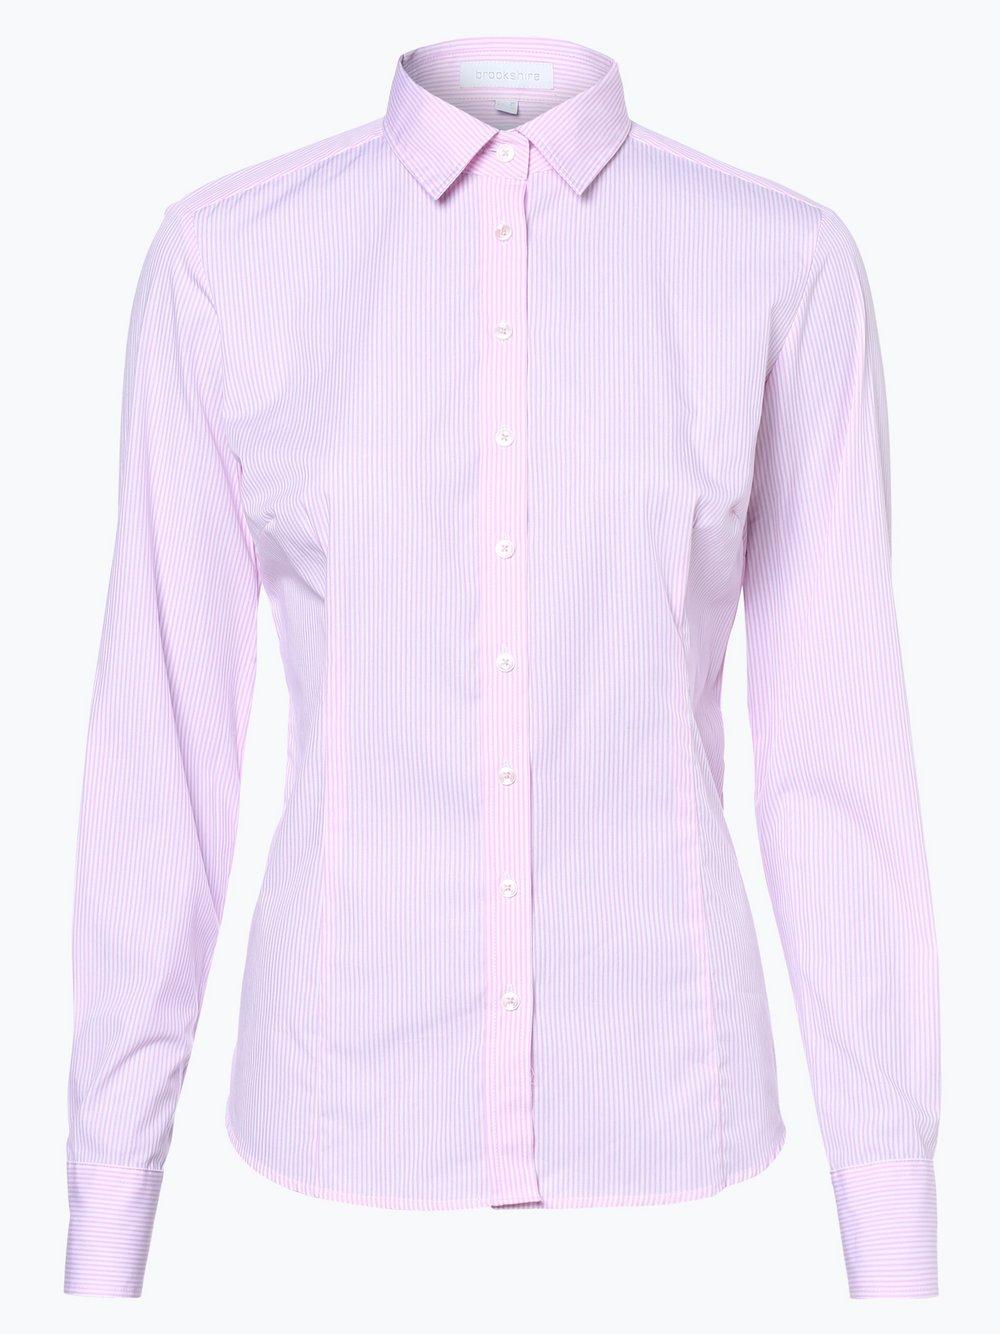 brookshire - Bluzka damska, różowy